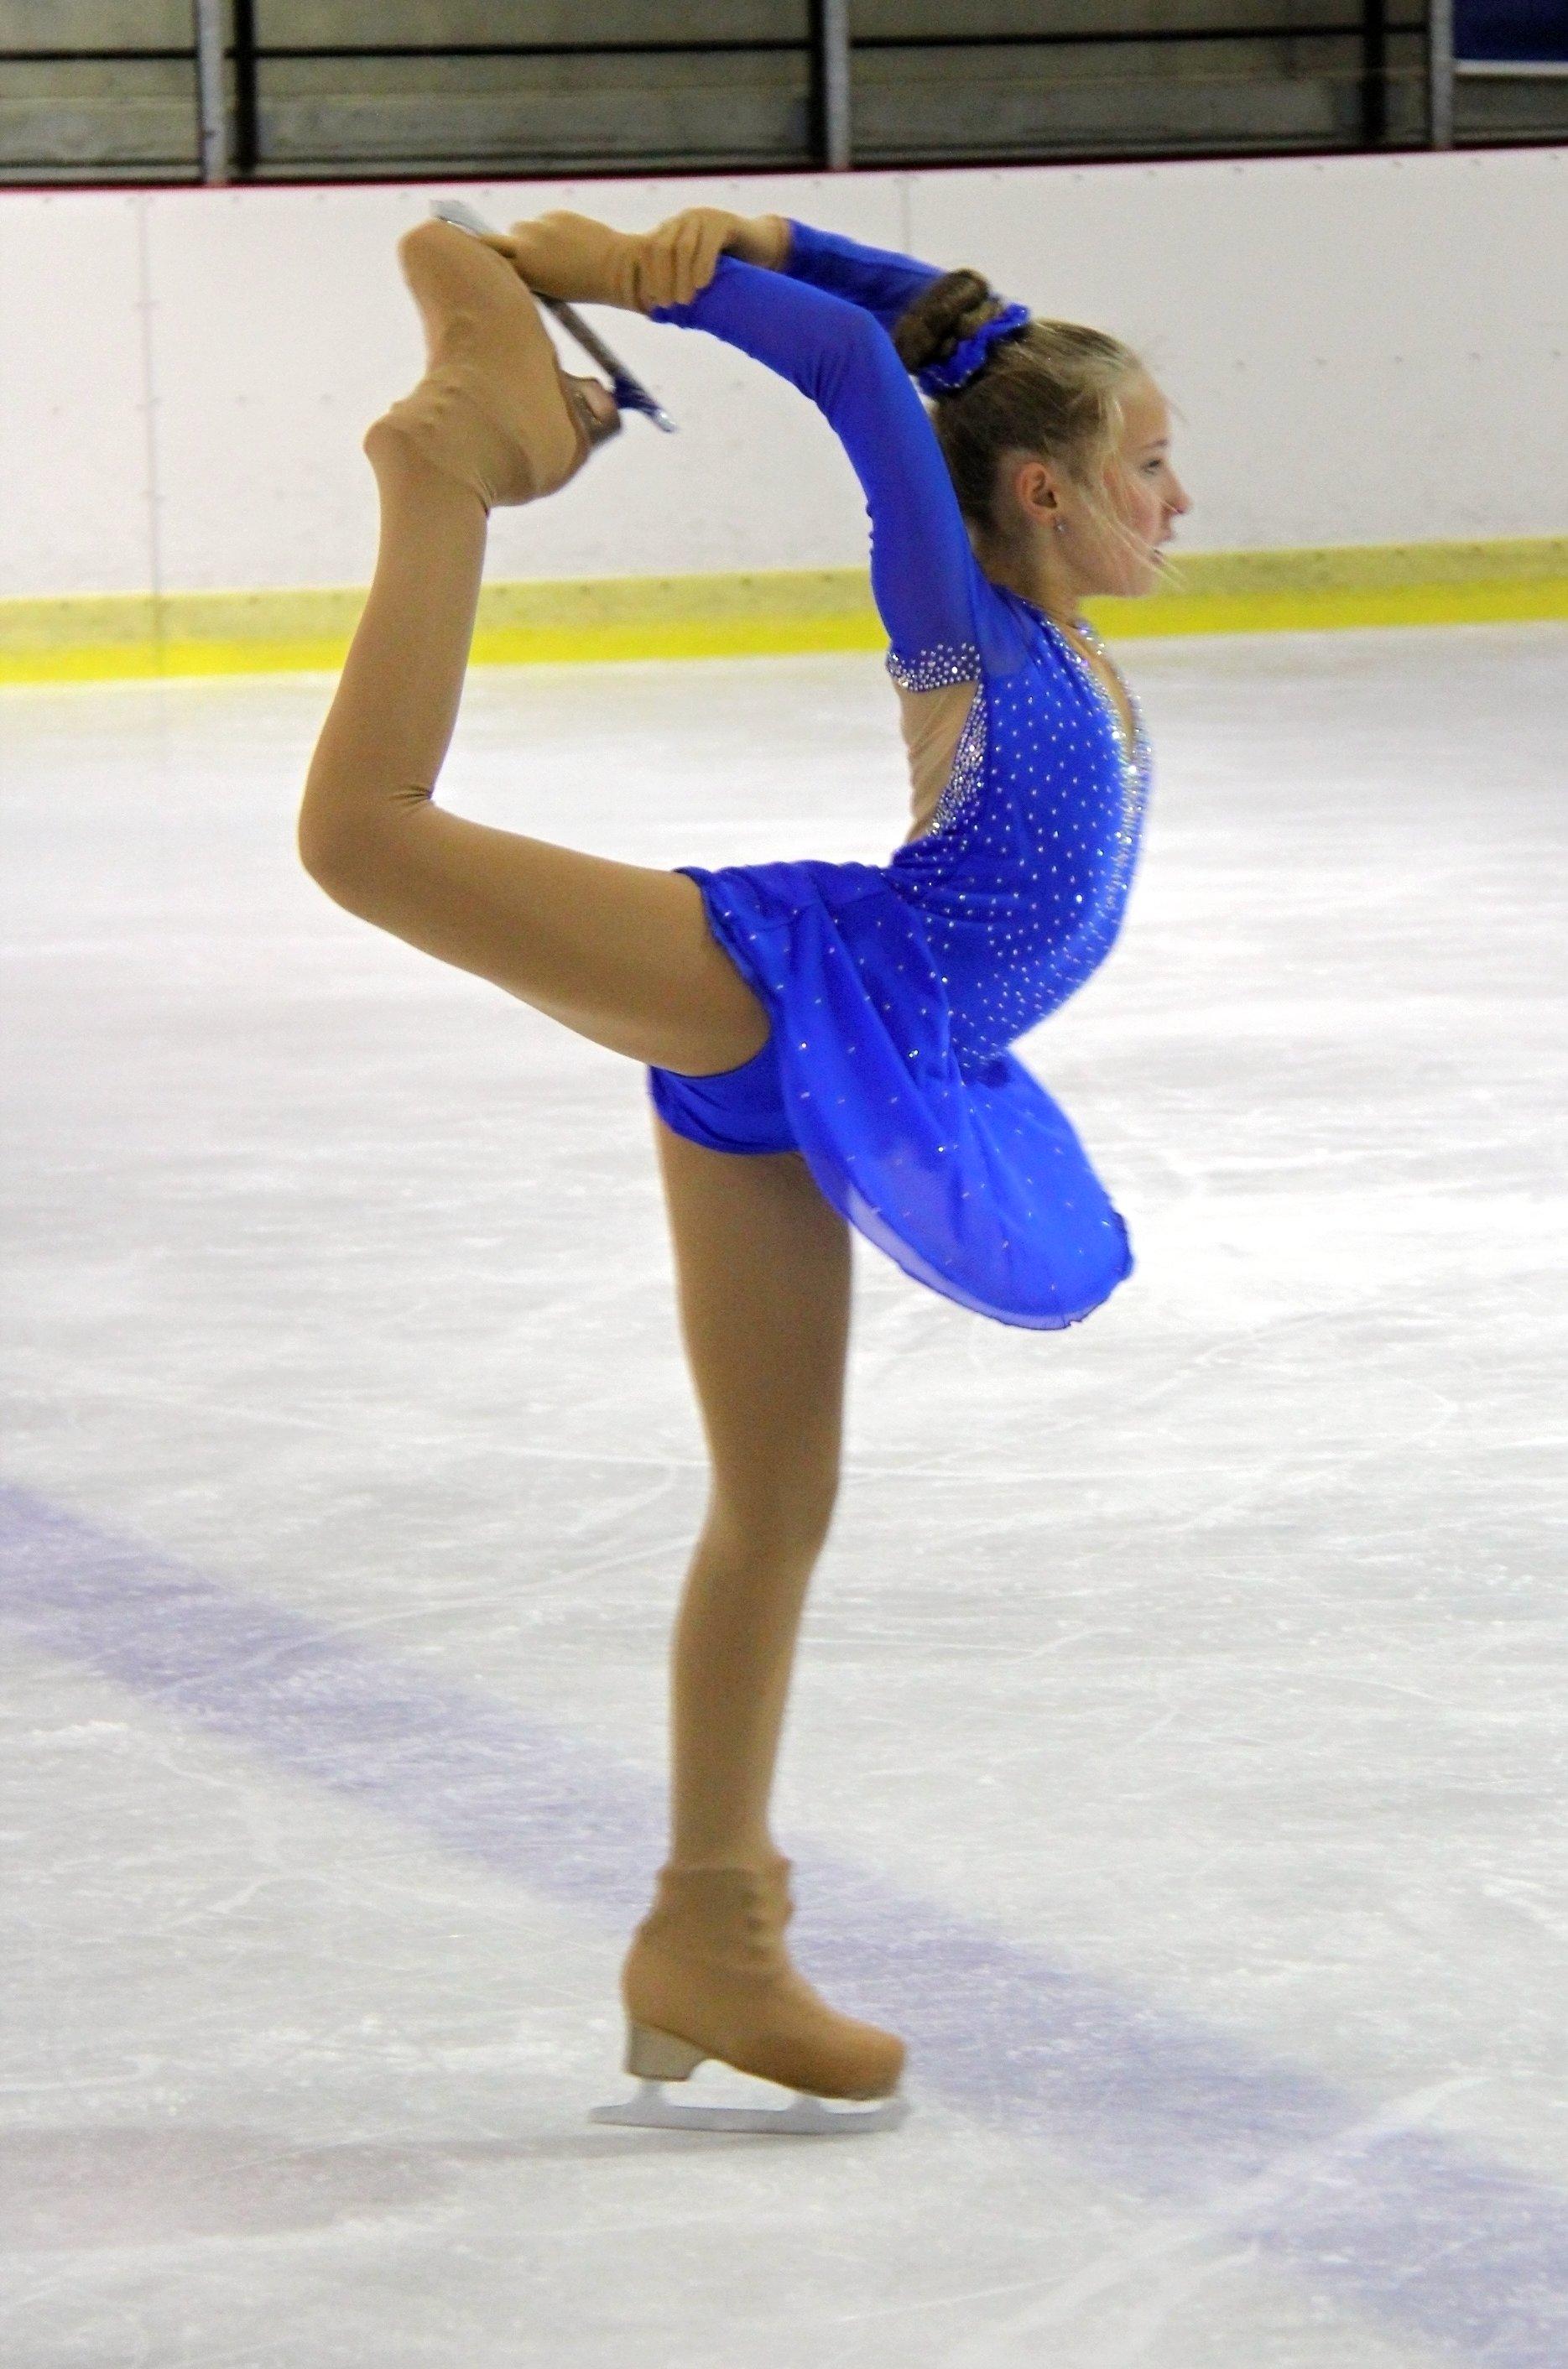 Sára Hlušková